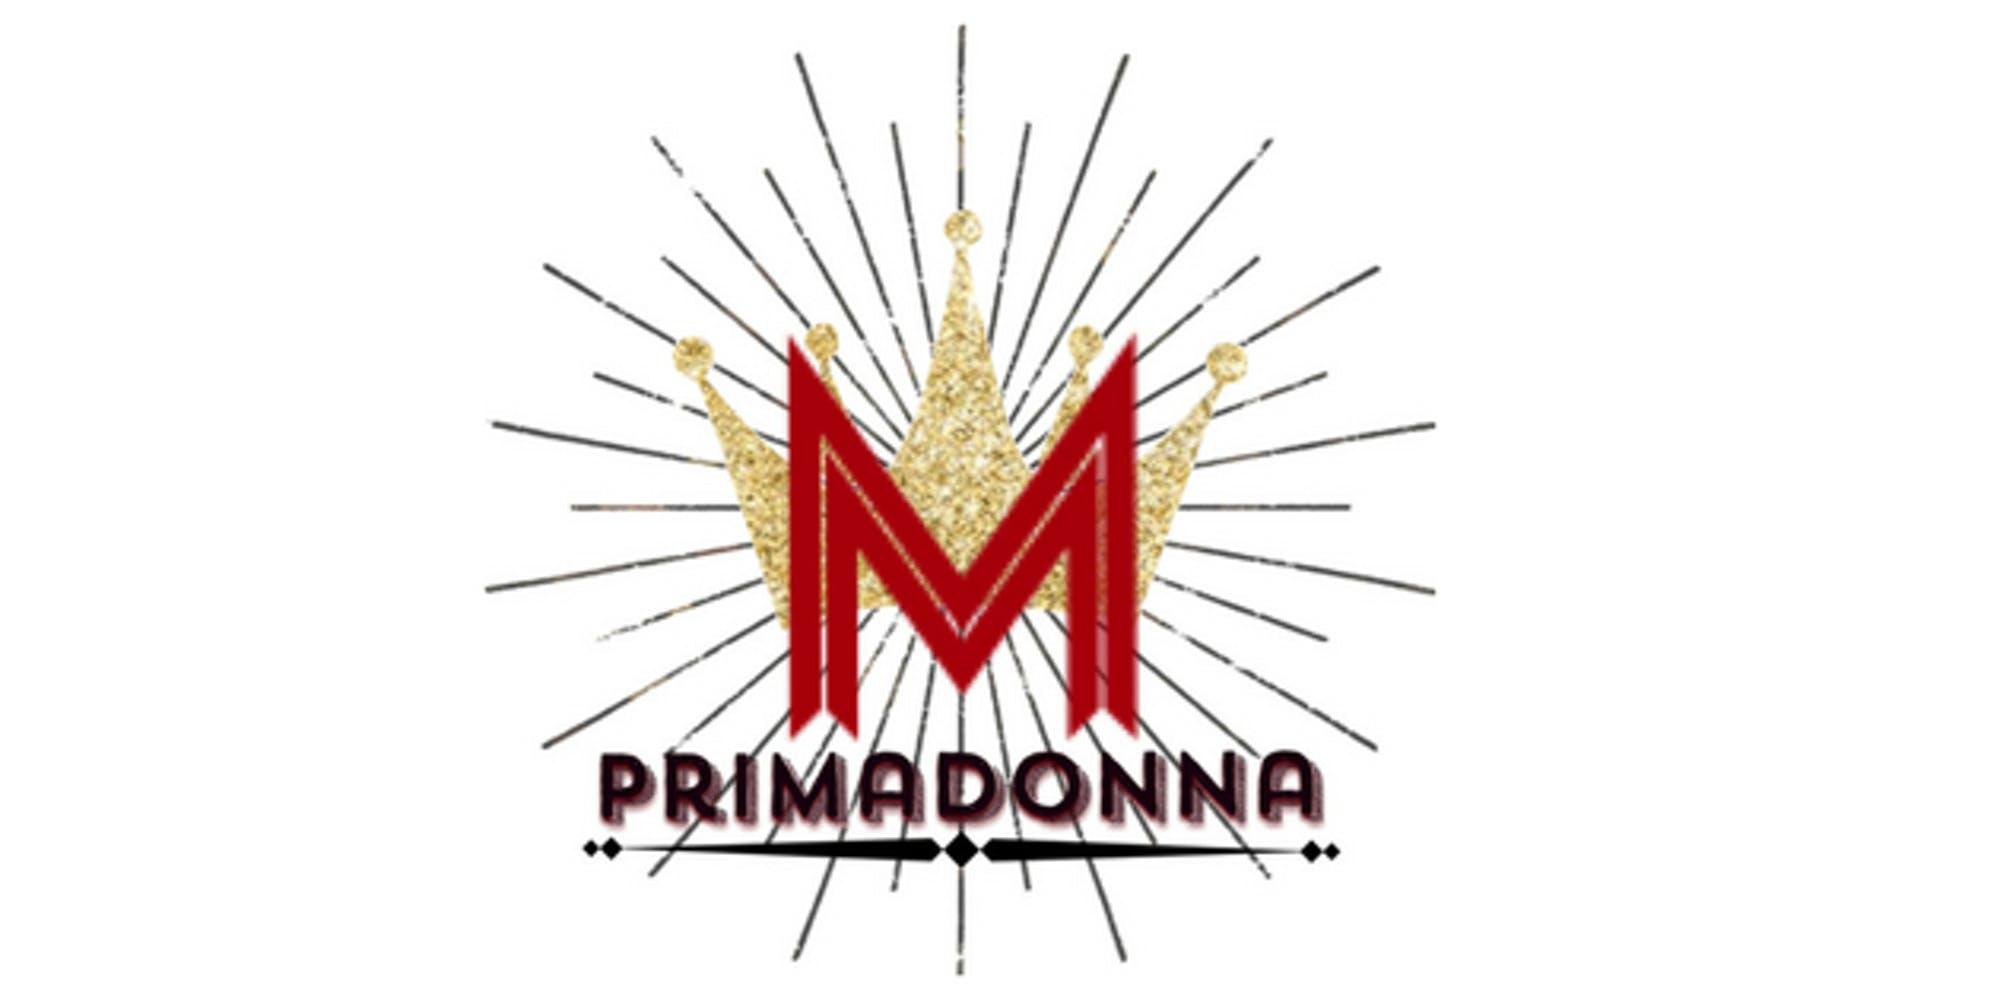 Promo image of PriMadonna (Madonna Tribute)